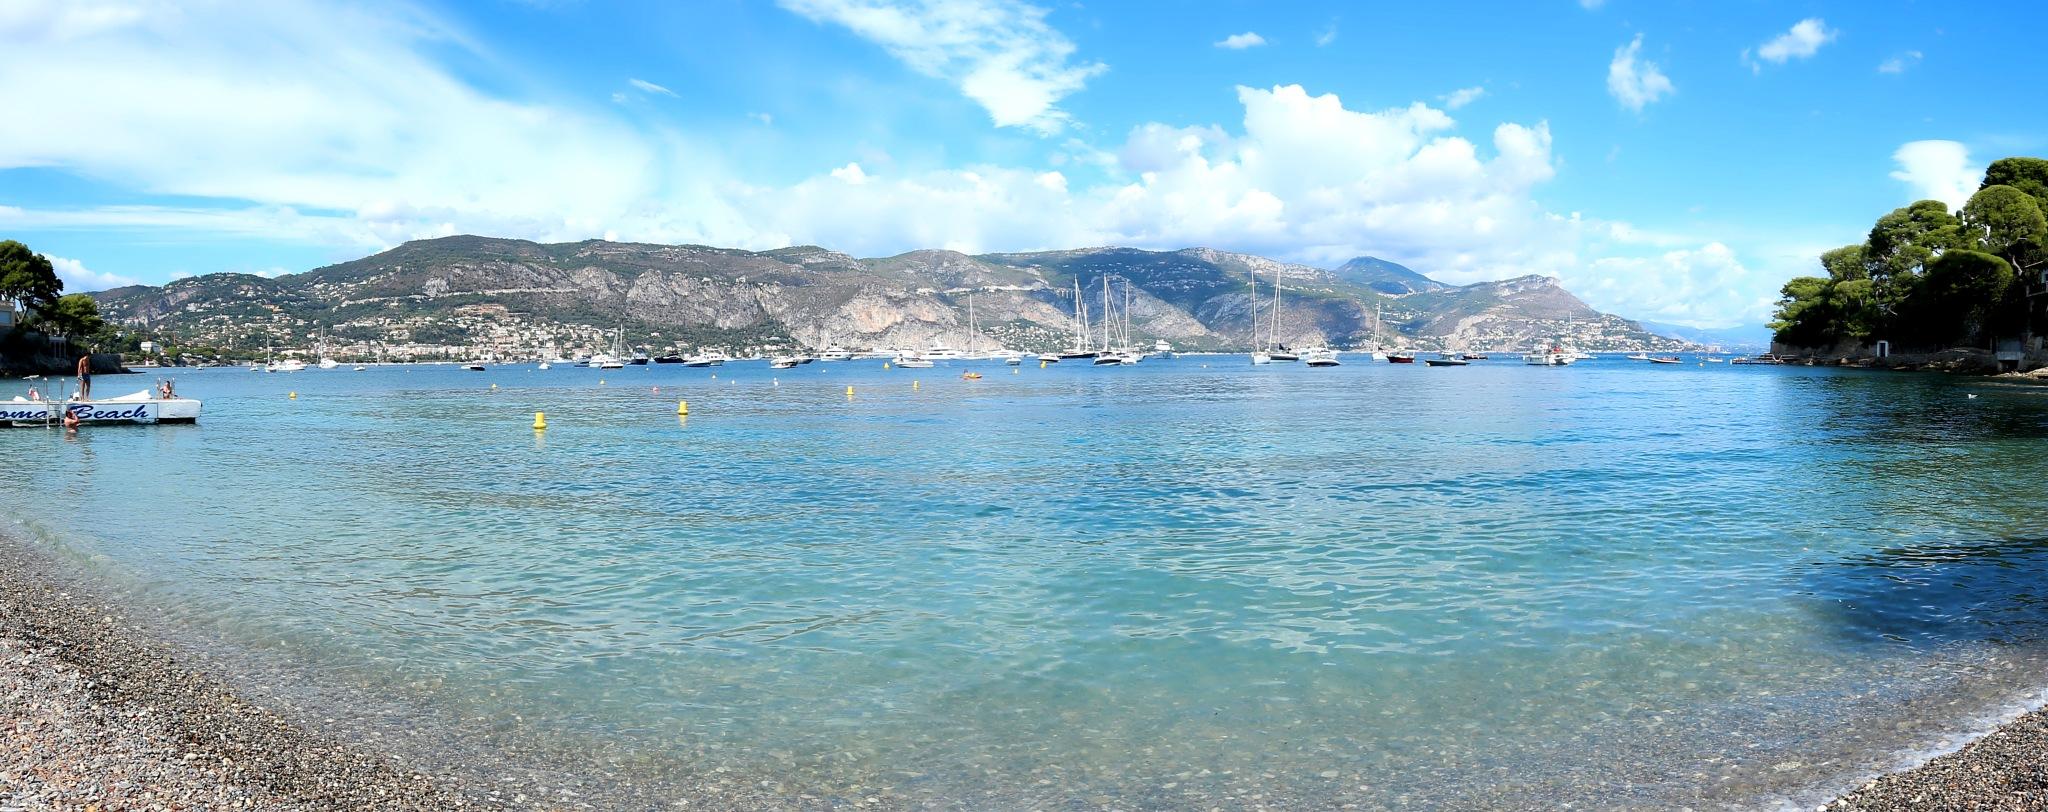 Paloma beach, Saint Jean Cap Ferrat by katze